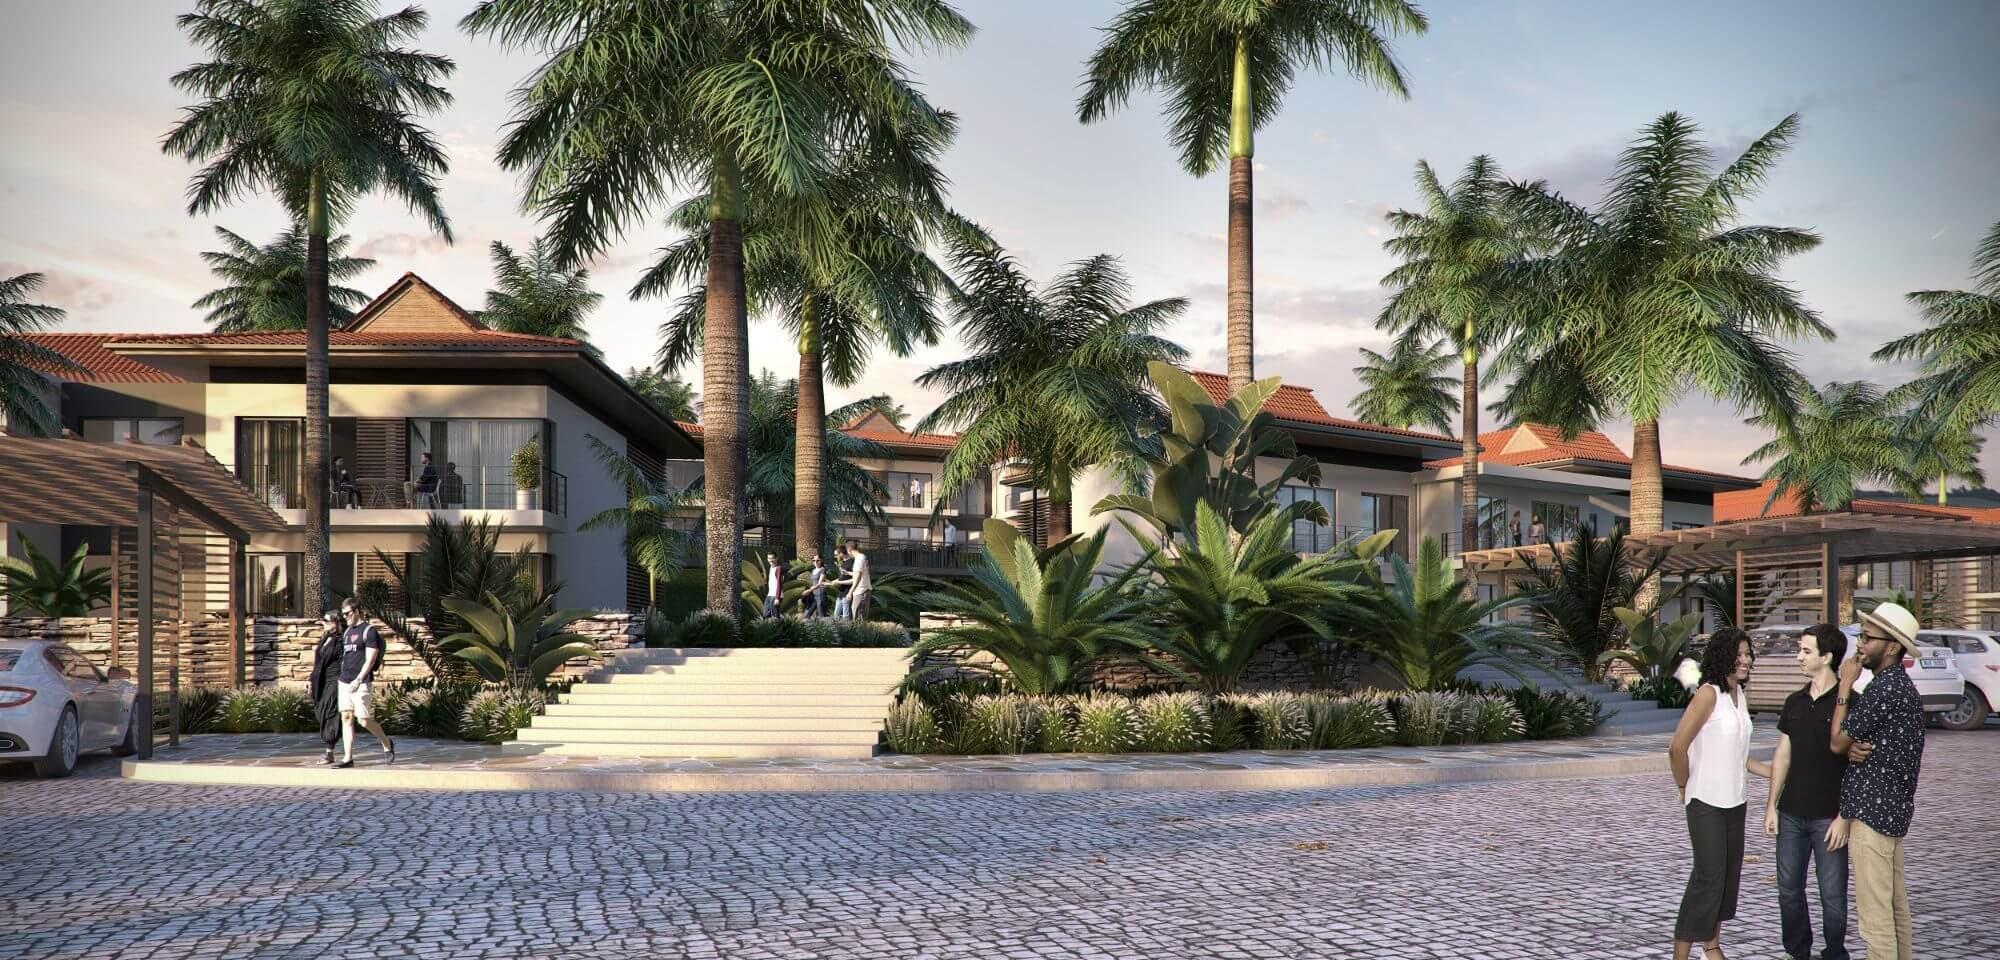 rcc oe39dzld932hm8yuutix5cq6qe87z1o39i8hpme60w - Estate Listing